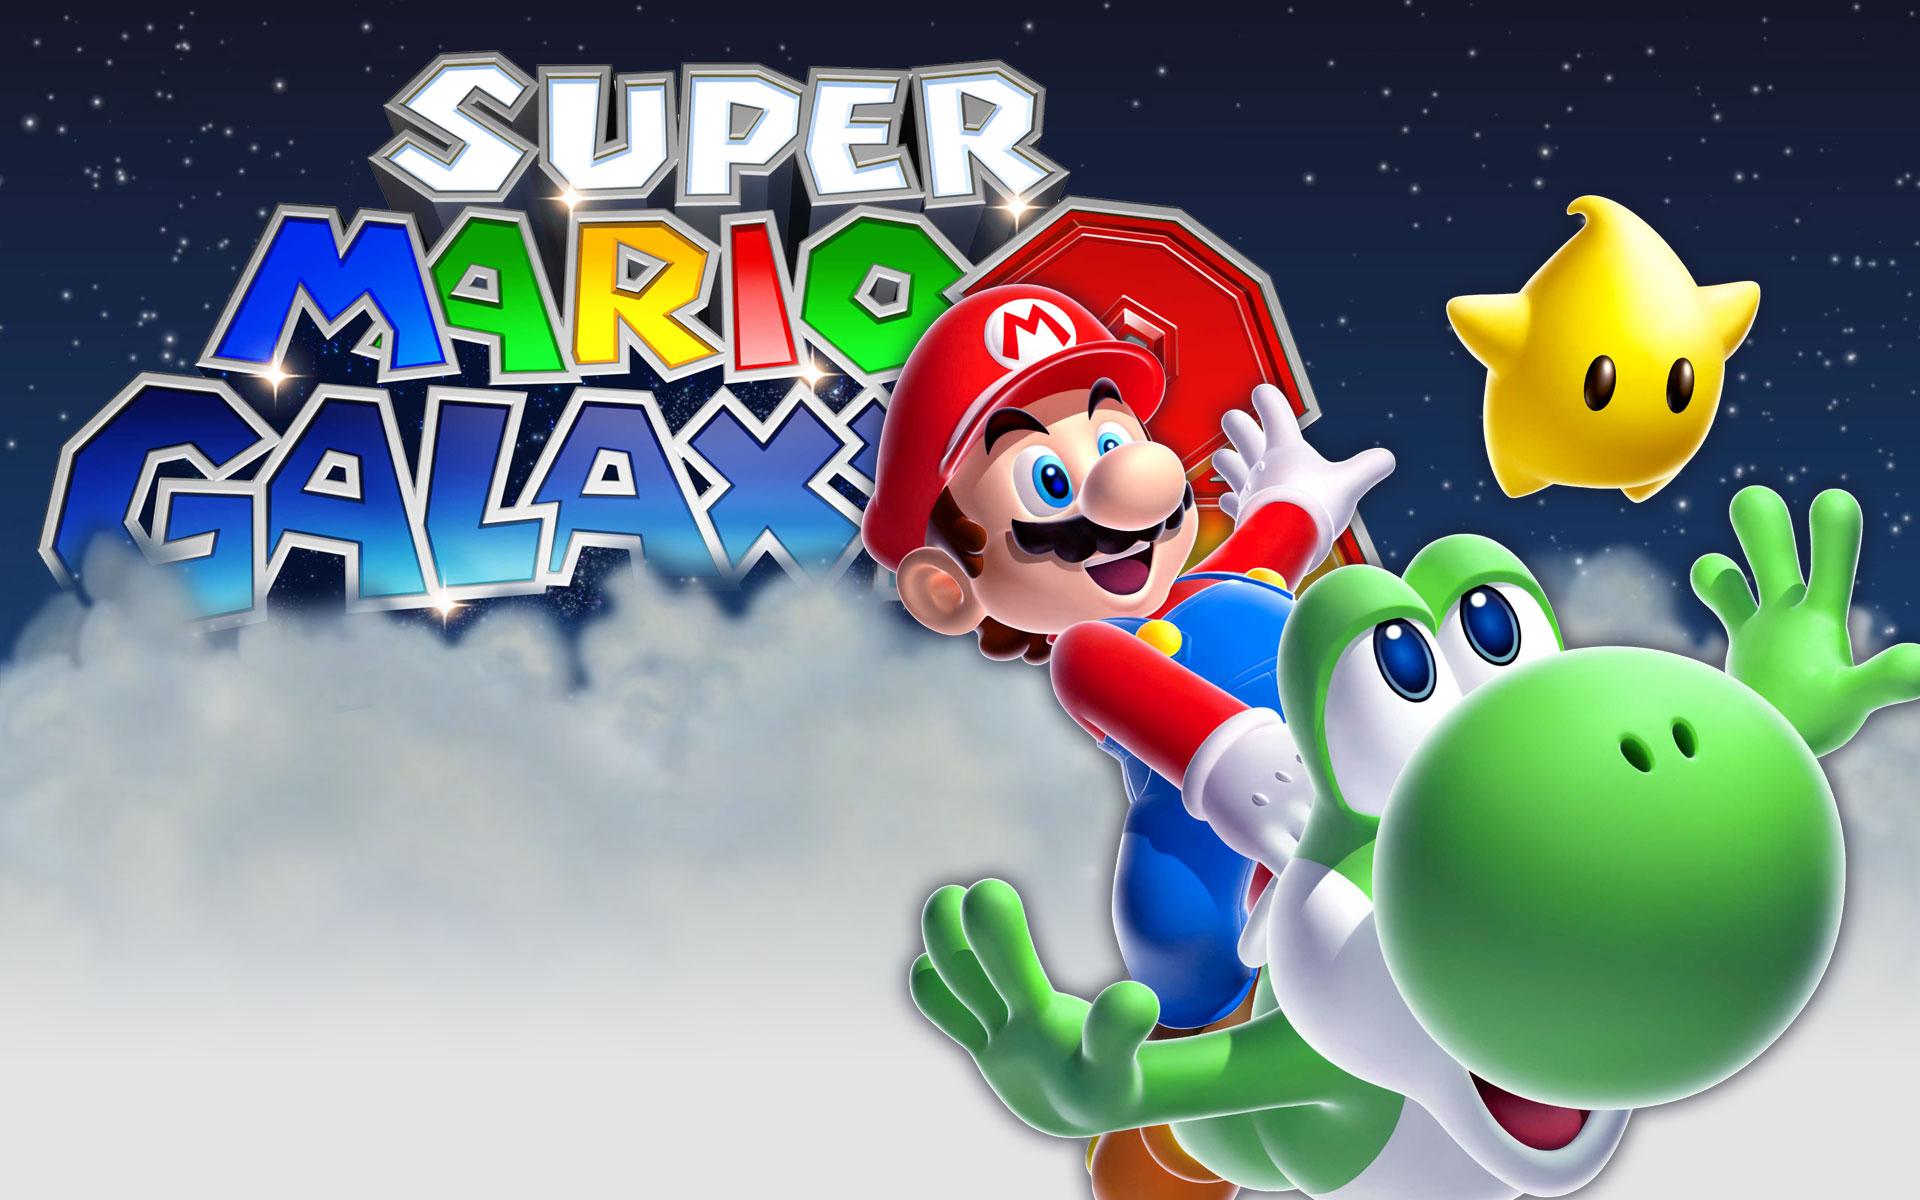 Super Mario Galaxy Wallpapers: Super Mario Galaxy 2 Full HD Wallpaper And Hintergrund